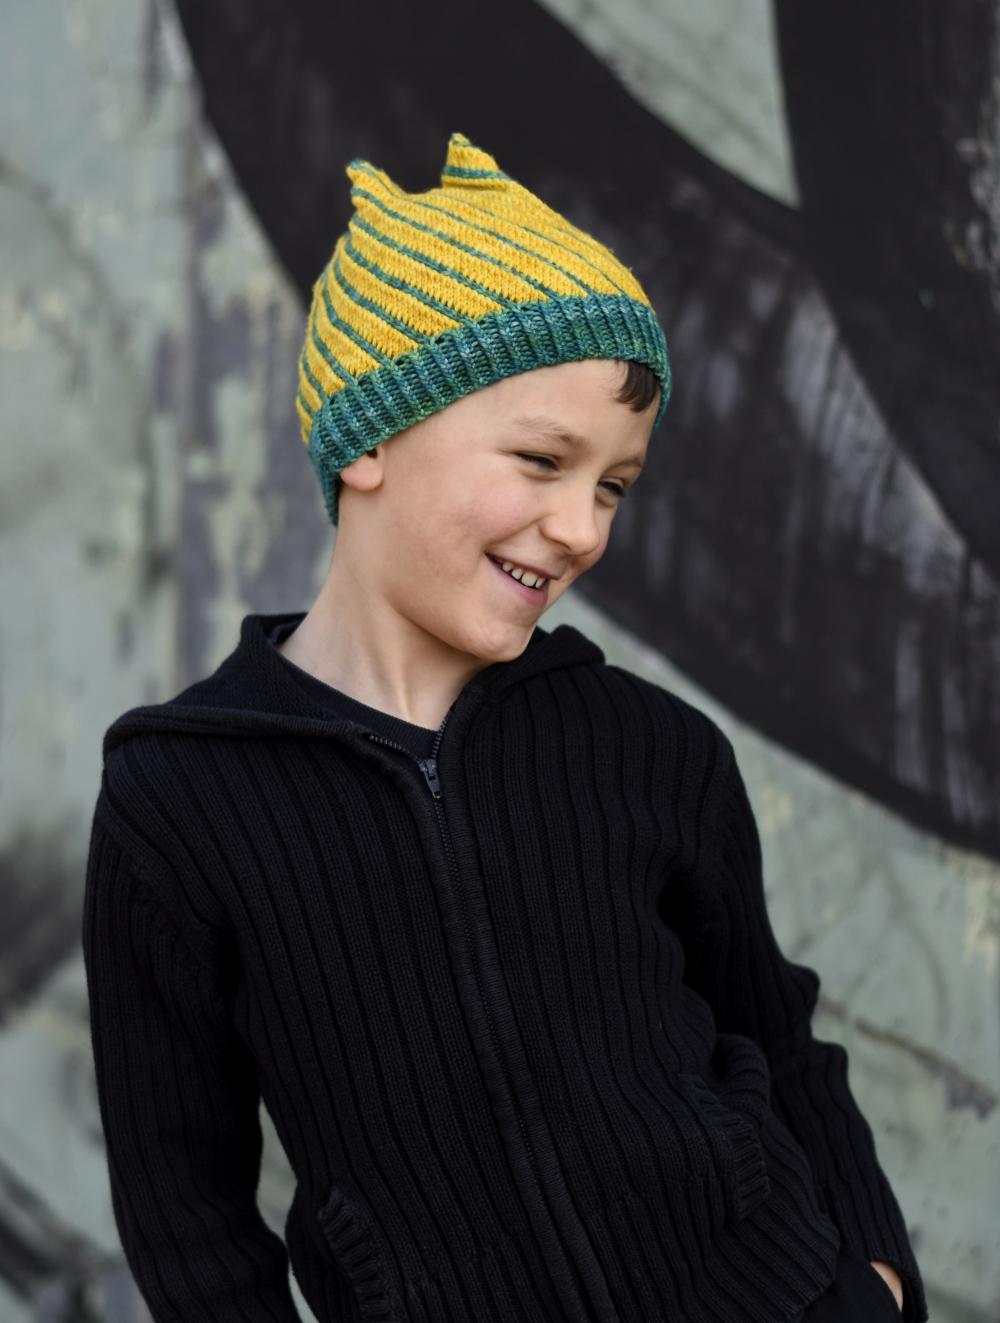 Torsione bia knit colourwork Hat knitting pattern